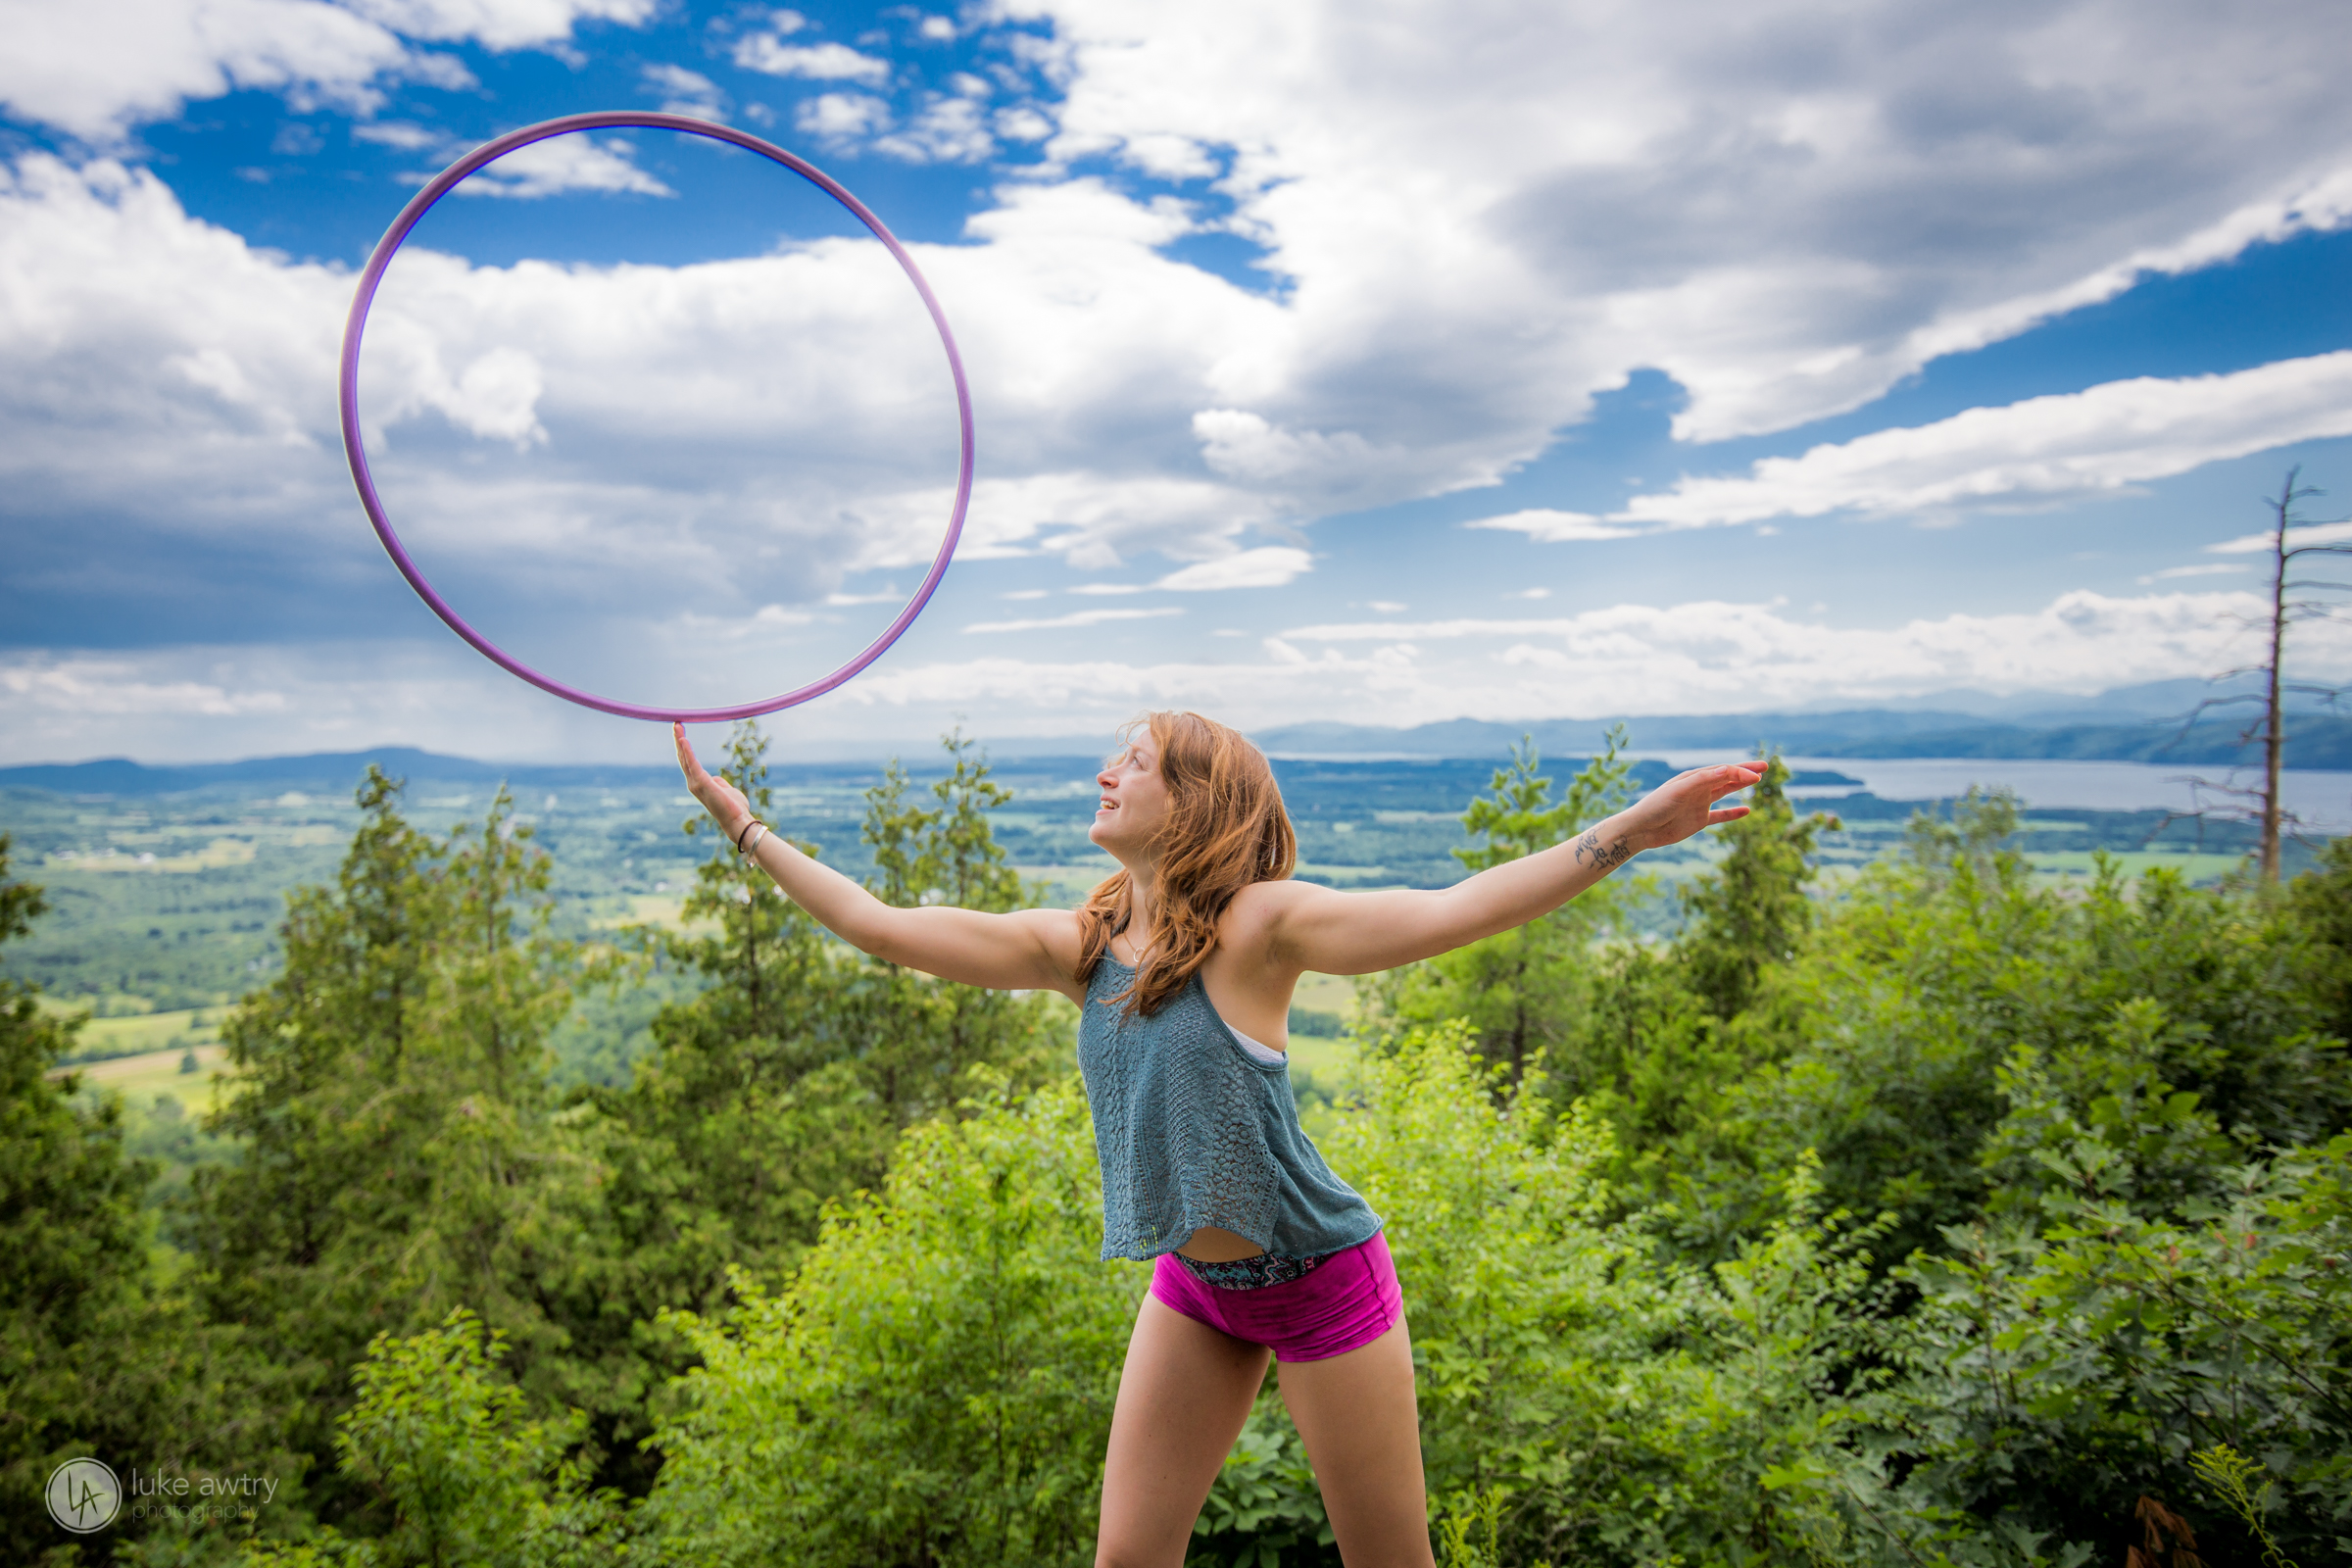 LUKE AWTRY PHOTOGRAPY - Hula Hopping Hannah - Mt Philo - 07092017-023.jpg